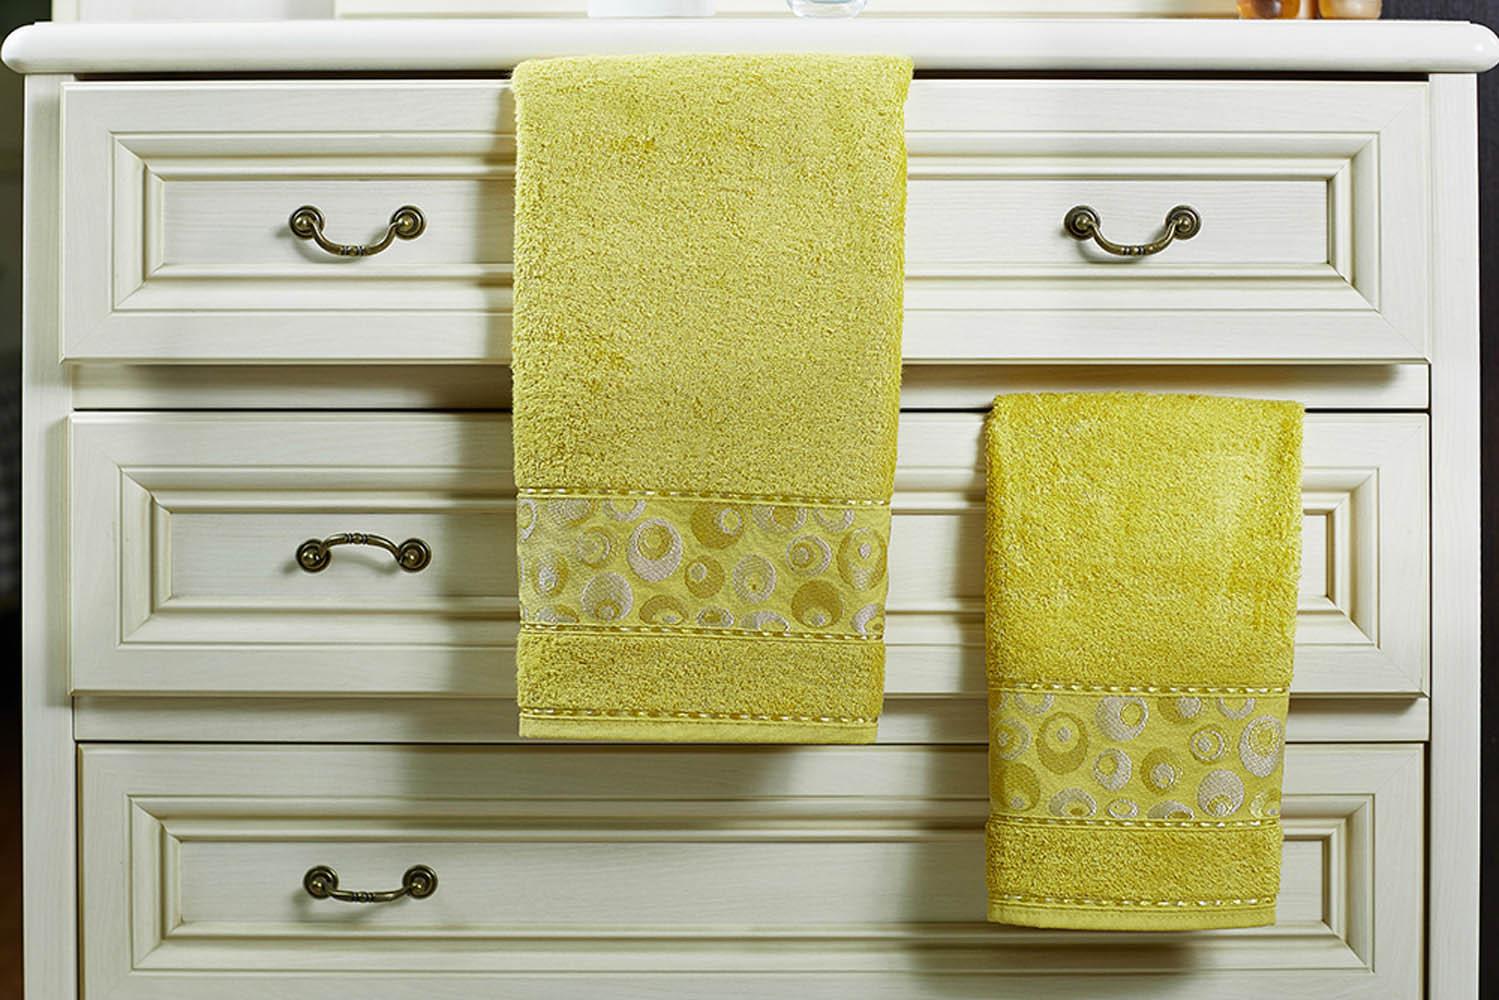 Полотенца Primavelle Полотенце Adele Цвет: Золото (50х90 см) полотенца primavelle полотенце adele цвет бежевый 50х90 см 70х140 см